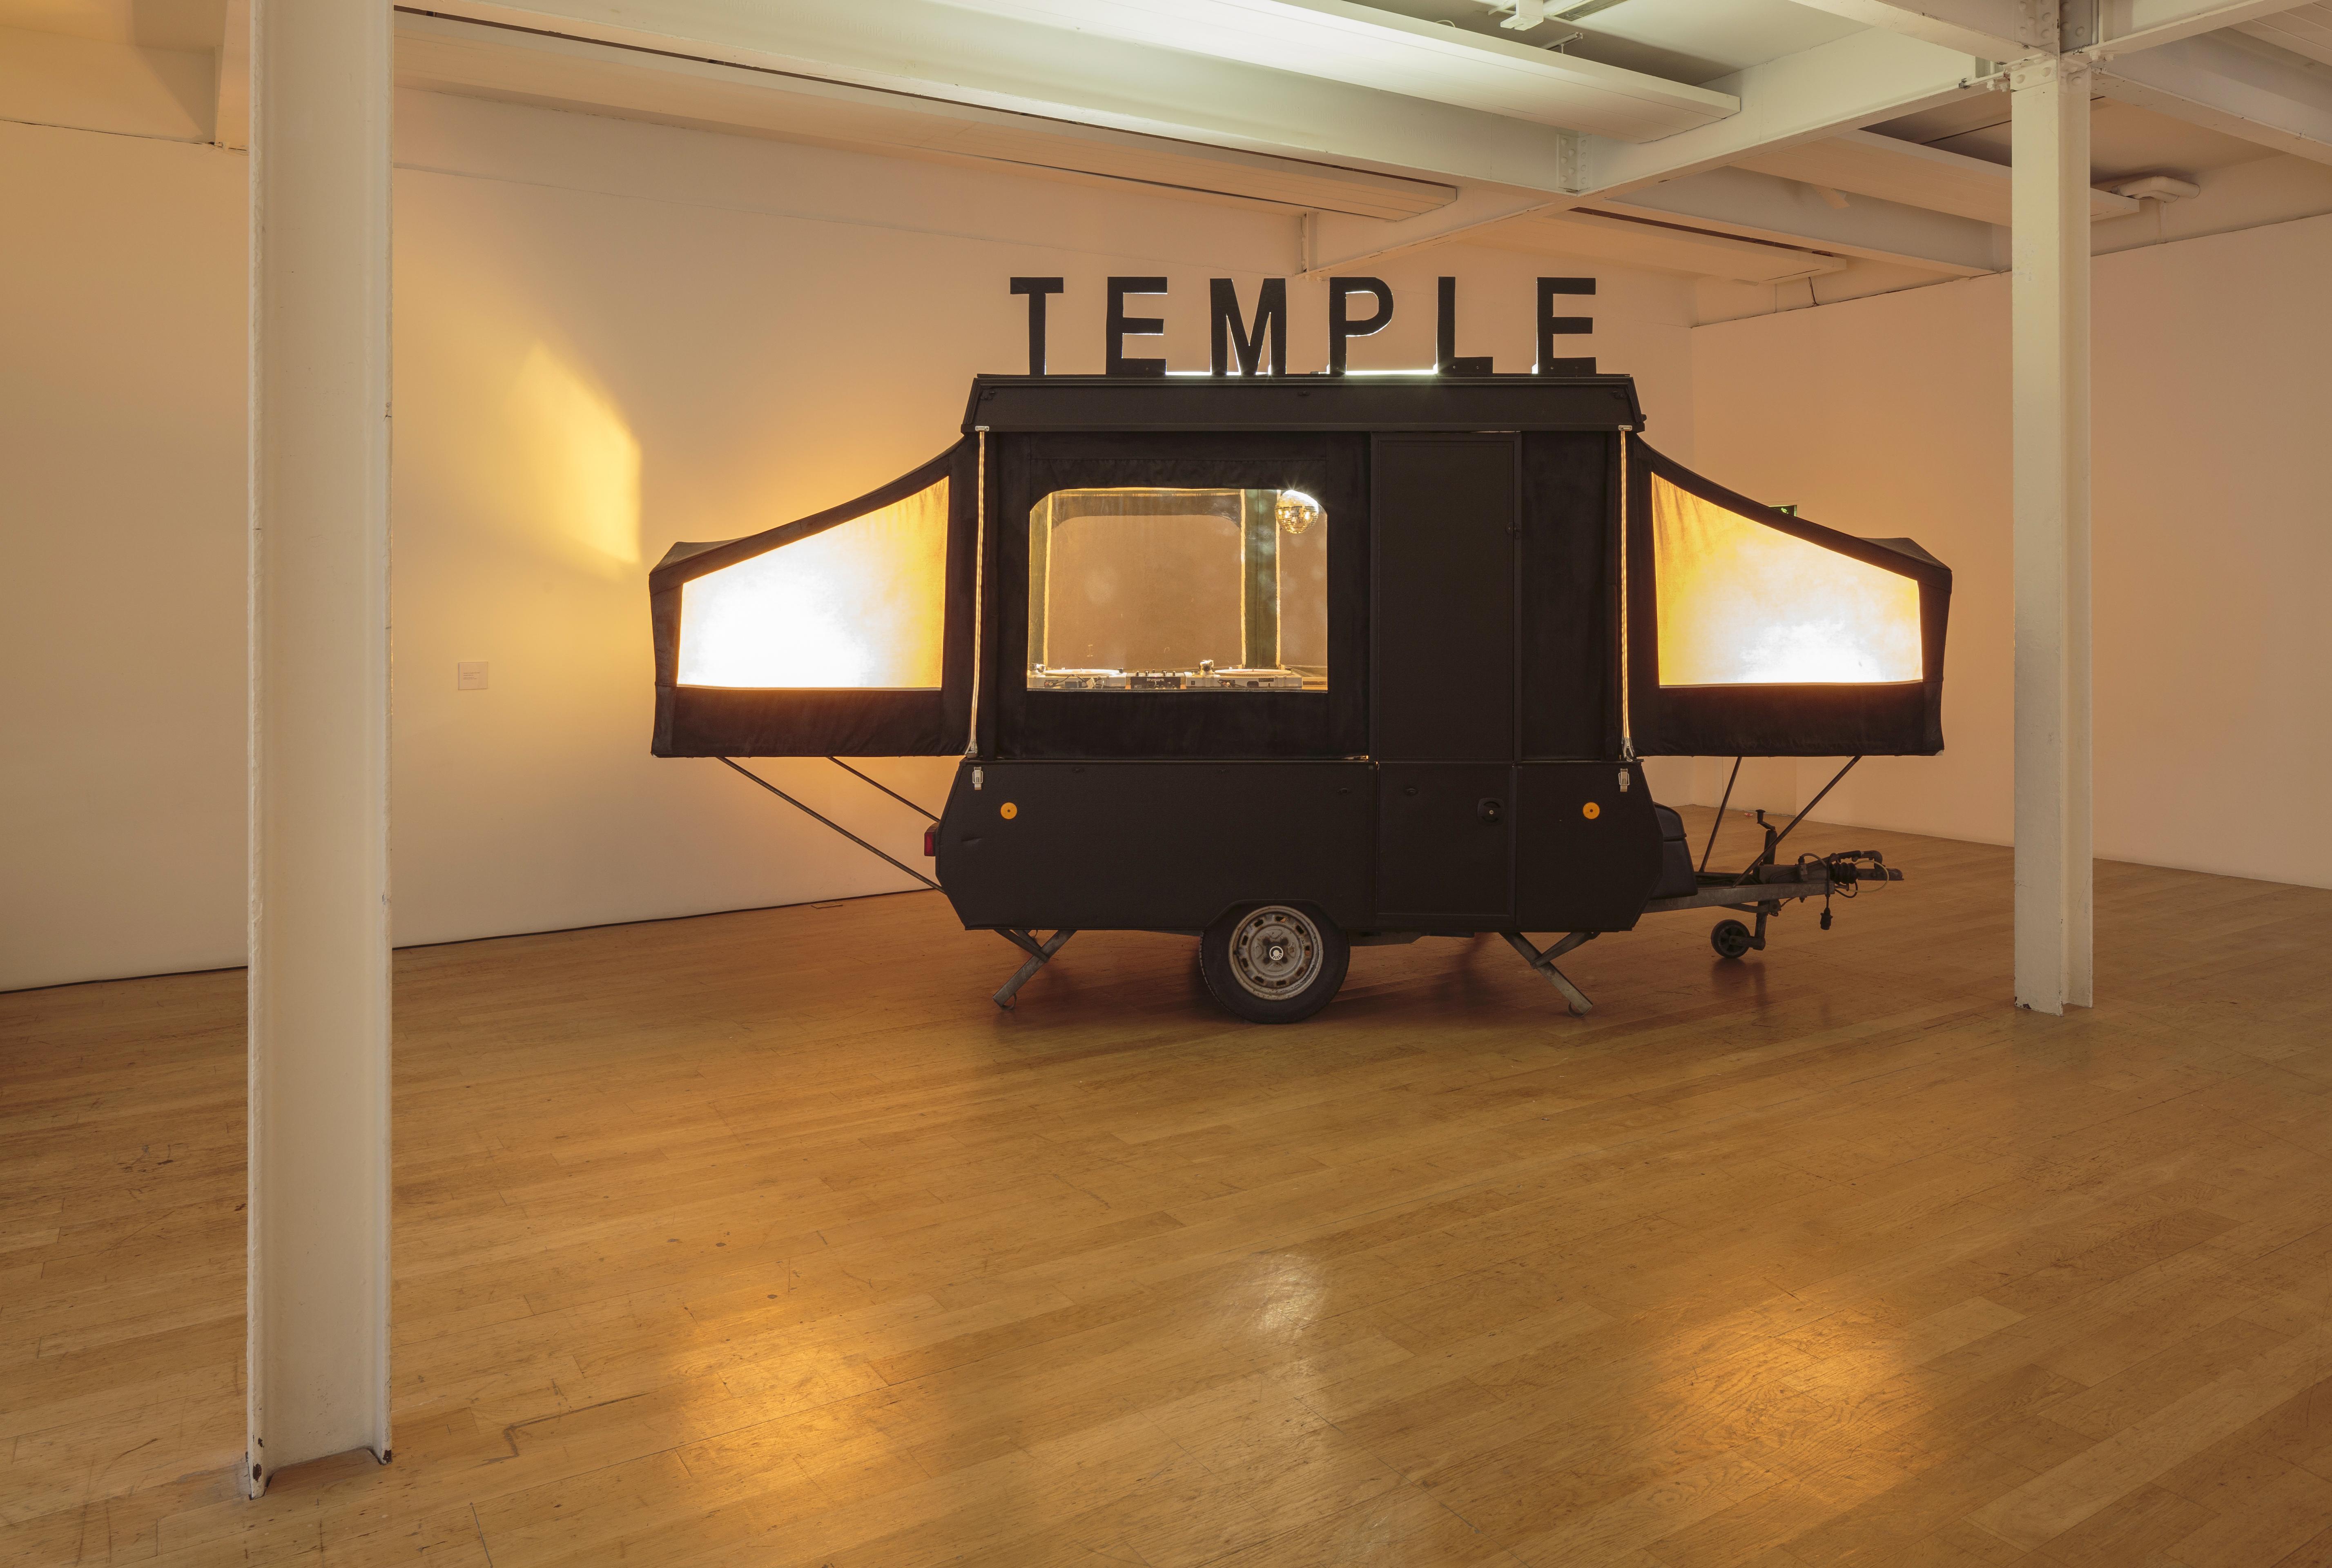 Jacqueline Donachie, Temple of Jackie, The Fruitmarket Gallery, 2017. Photo: Ruth Clark